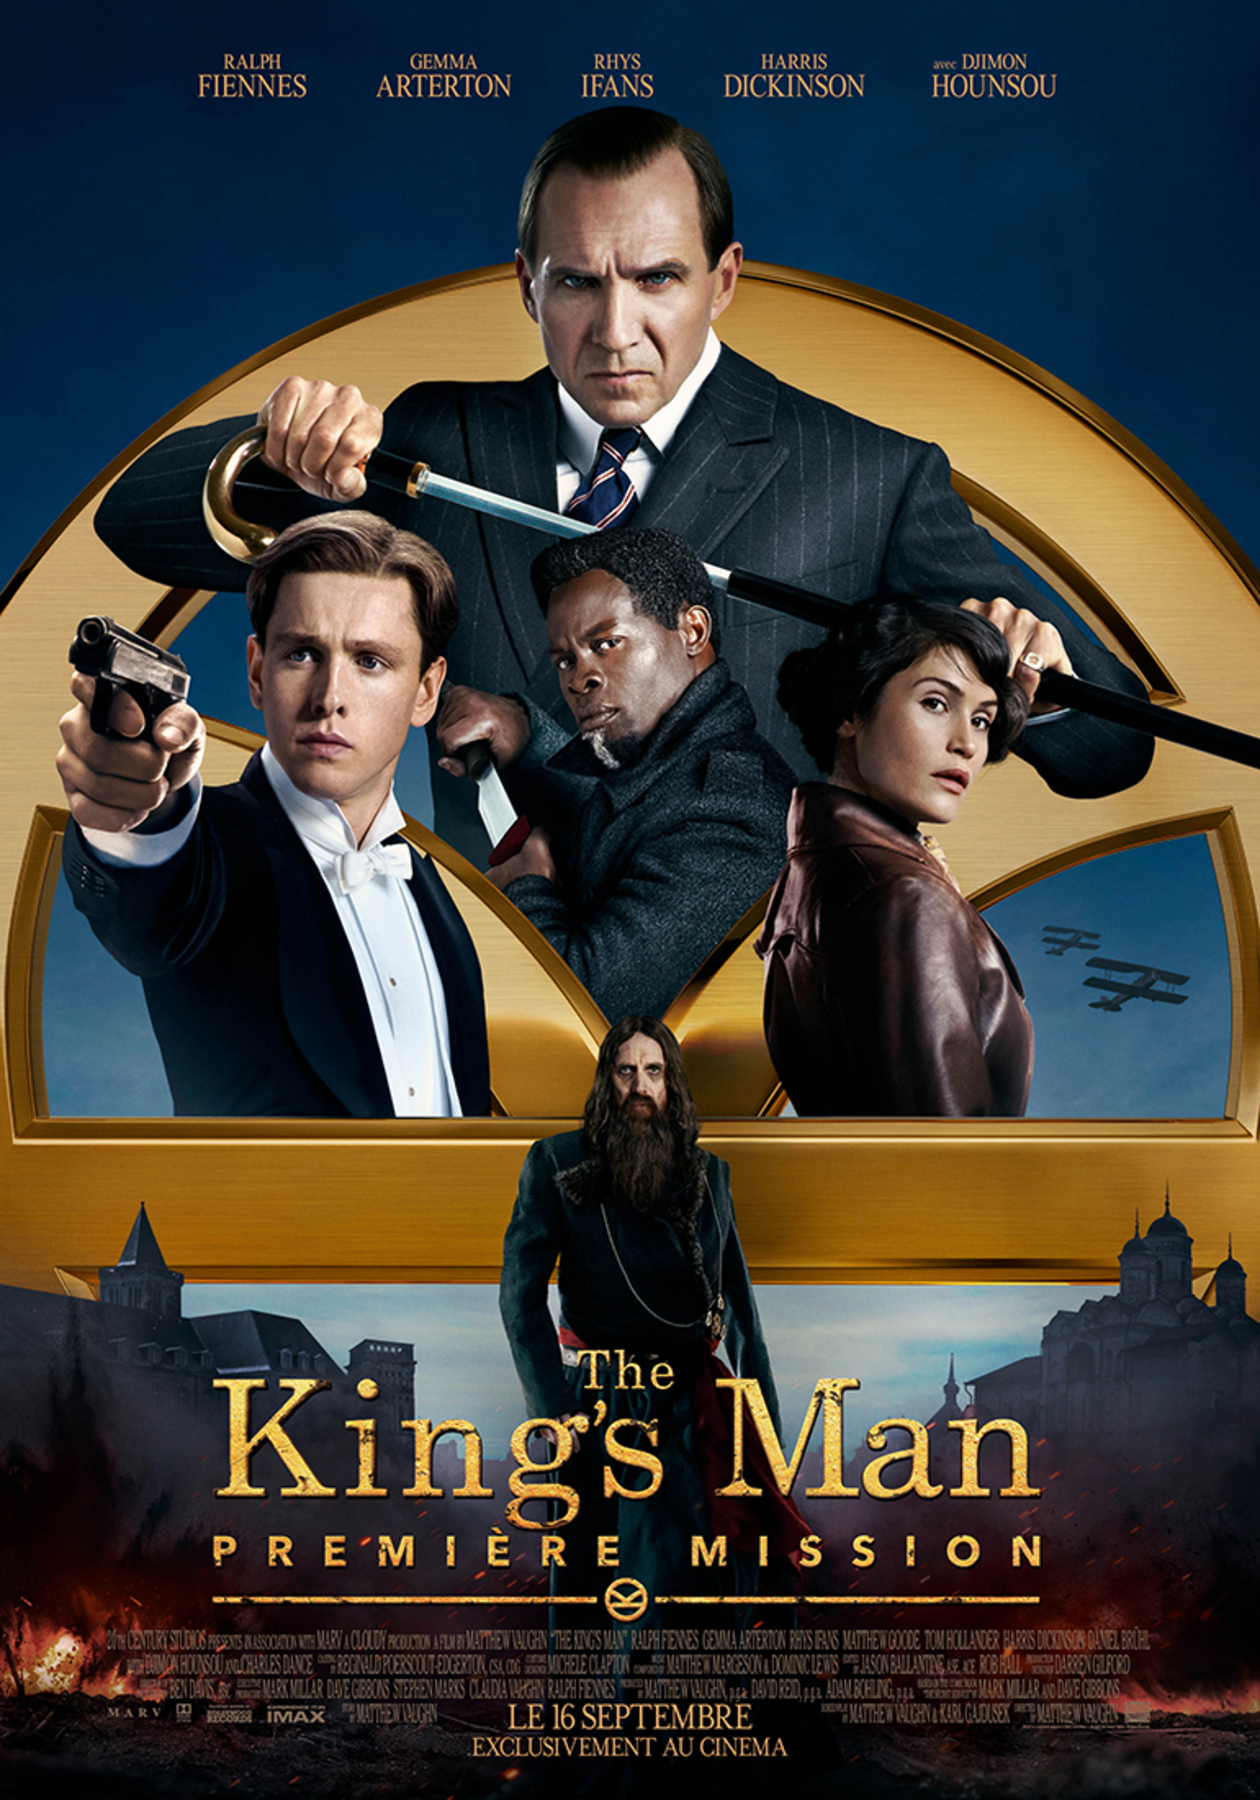 affiche poster king man premiere mission disney fox